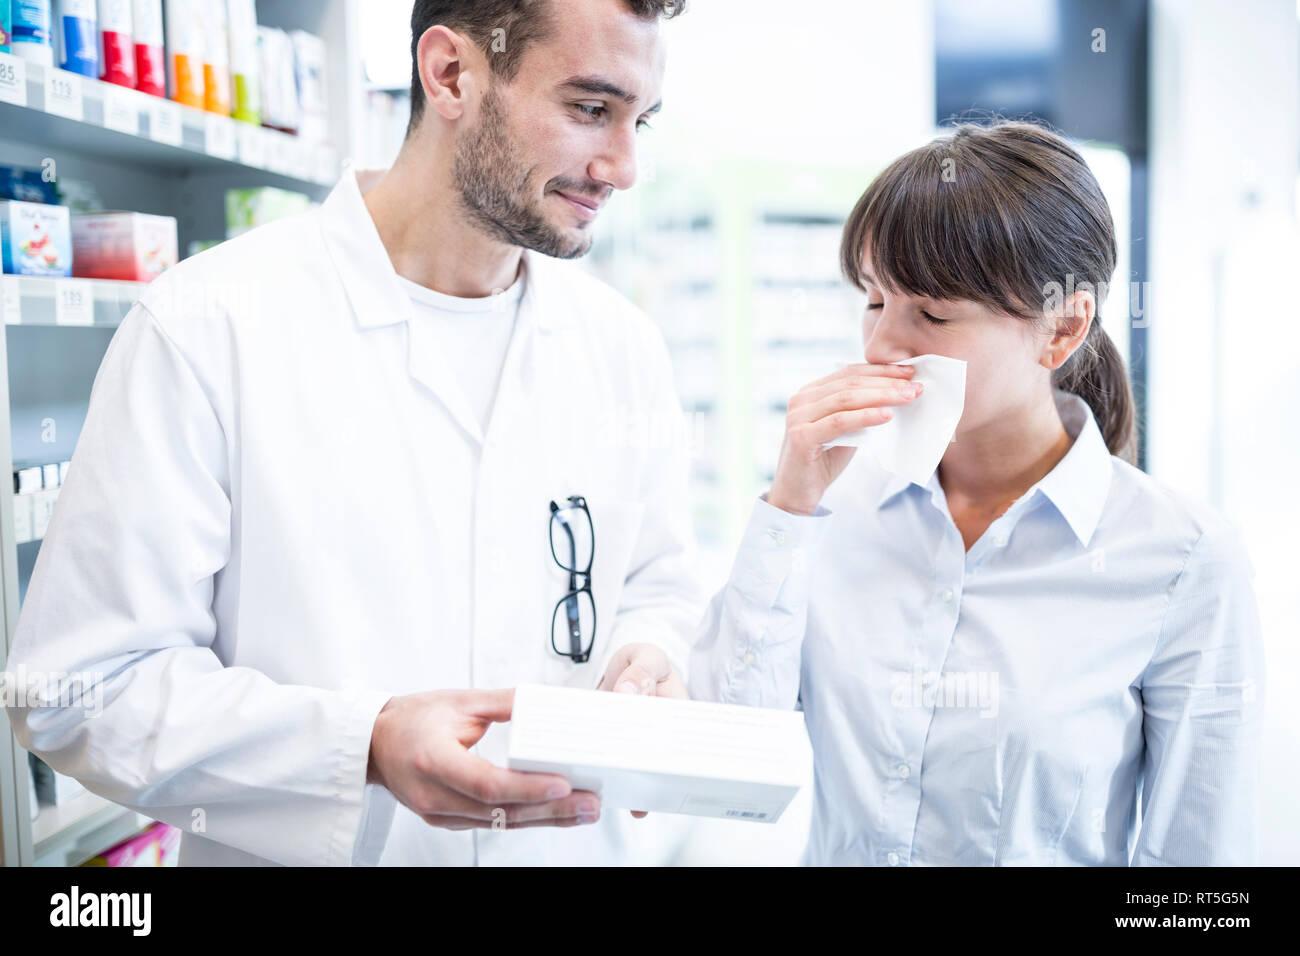 Pharmacist advising customer in pharmacy - Stock Image